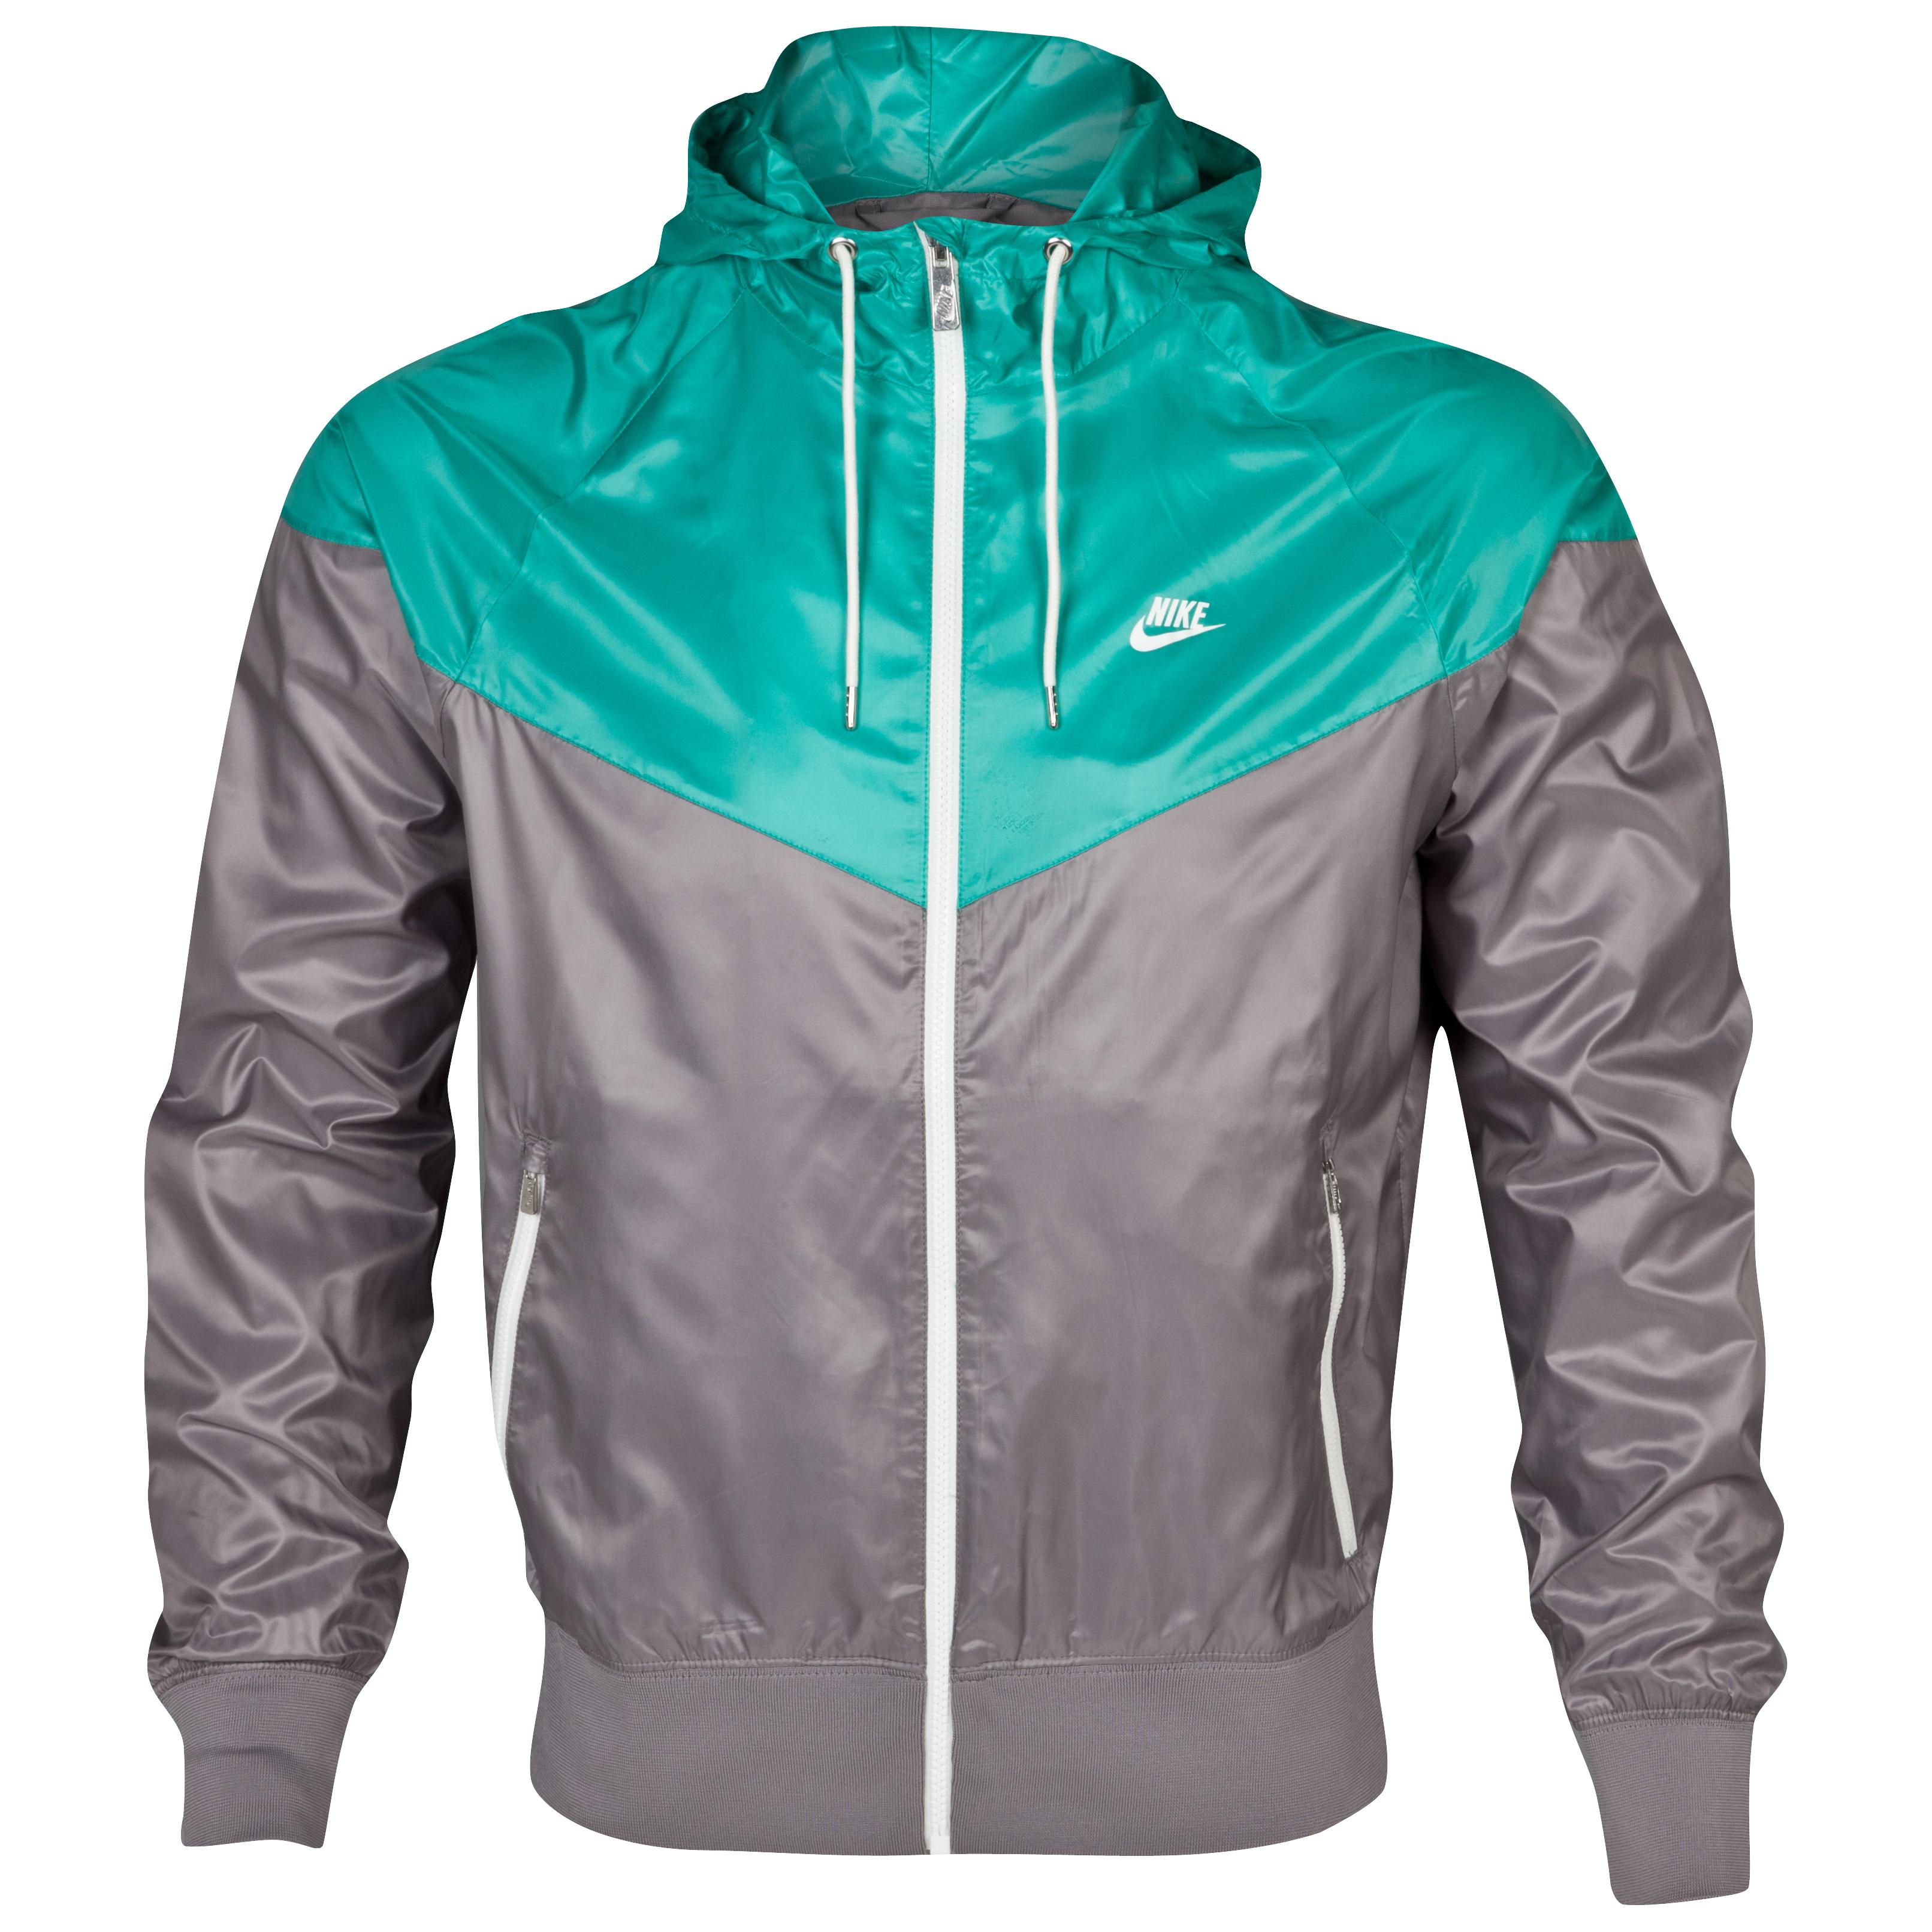 Nike Windrunner Jacket - Sport Grey/Atomic Teal